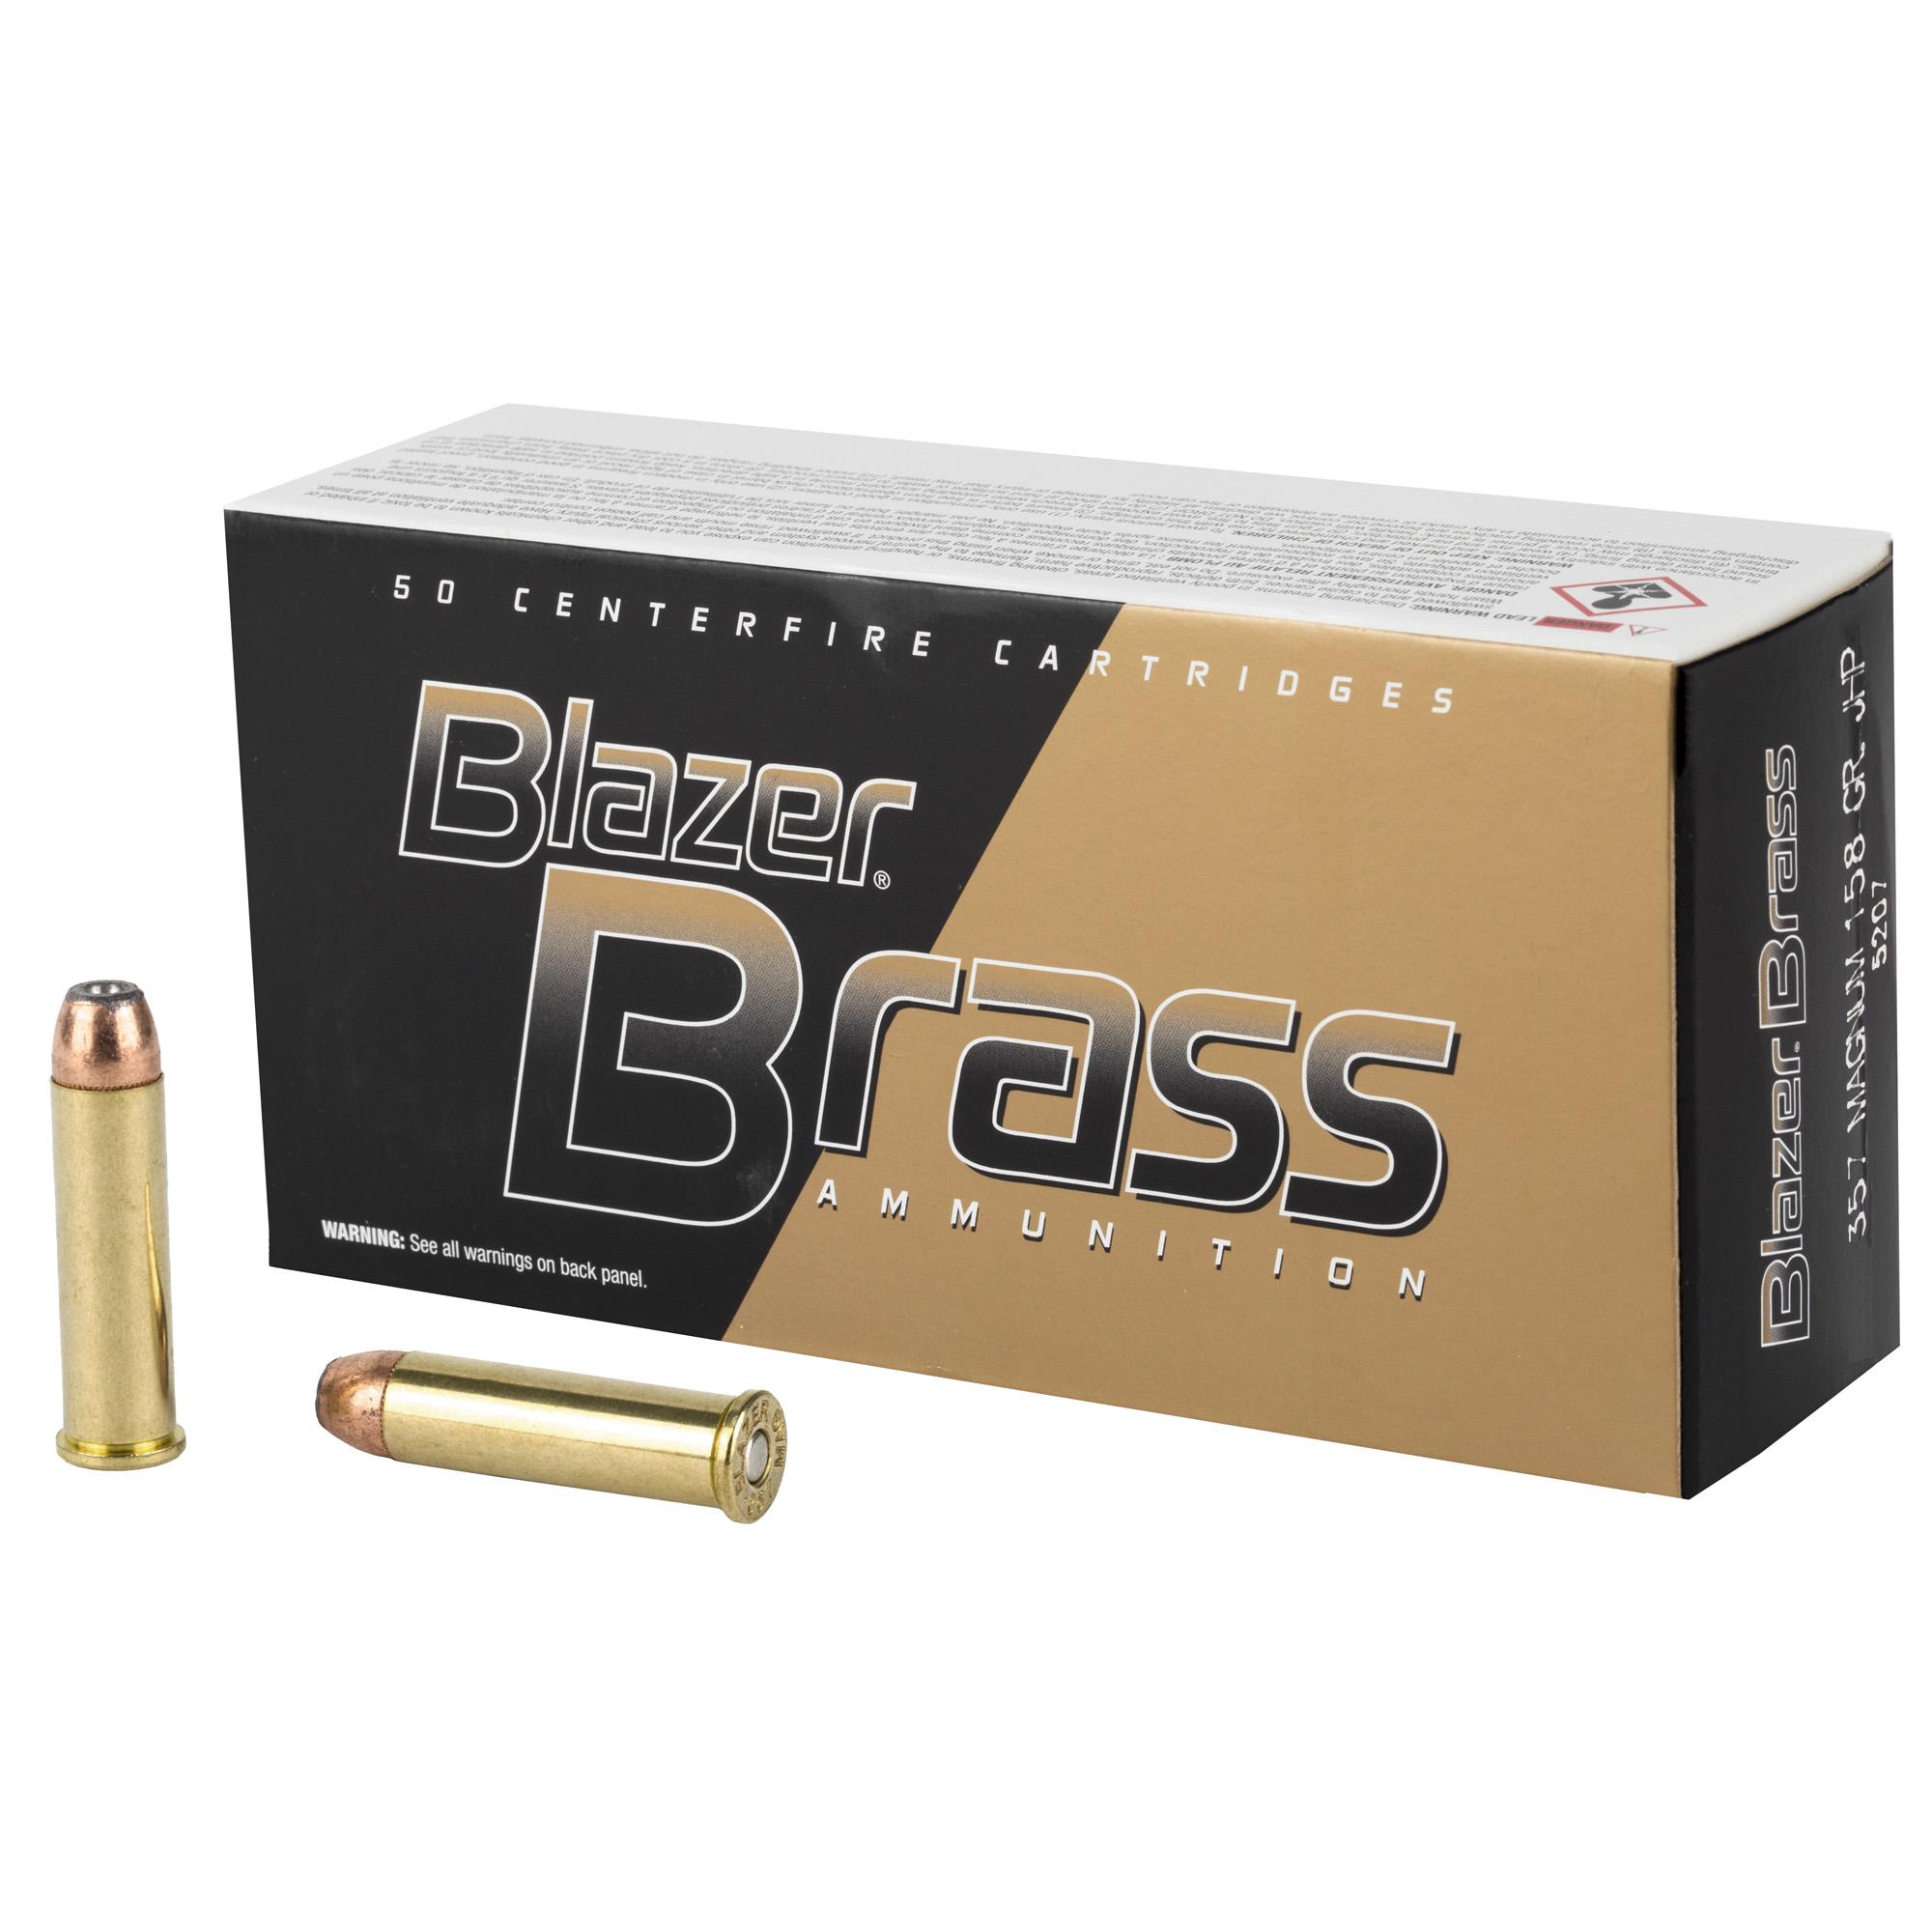 Cci Blazer Brass 357mag 158 50/1000